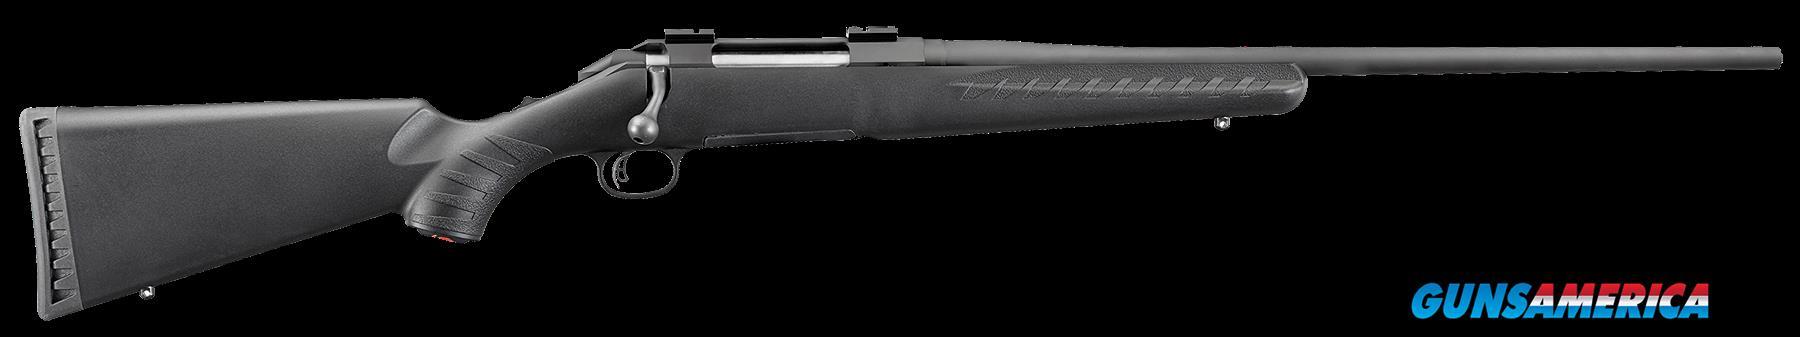 Ruger American, Rug*6903  American  308              Blk-syn  Guns > Pistols > 1911 Pistol Copies (non-Colt)